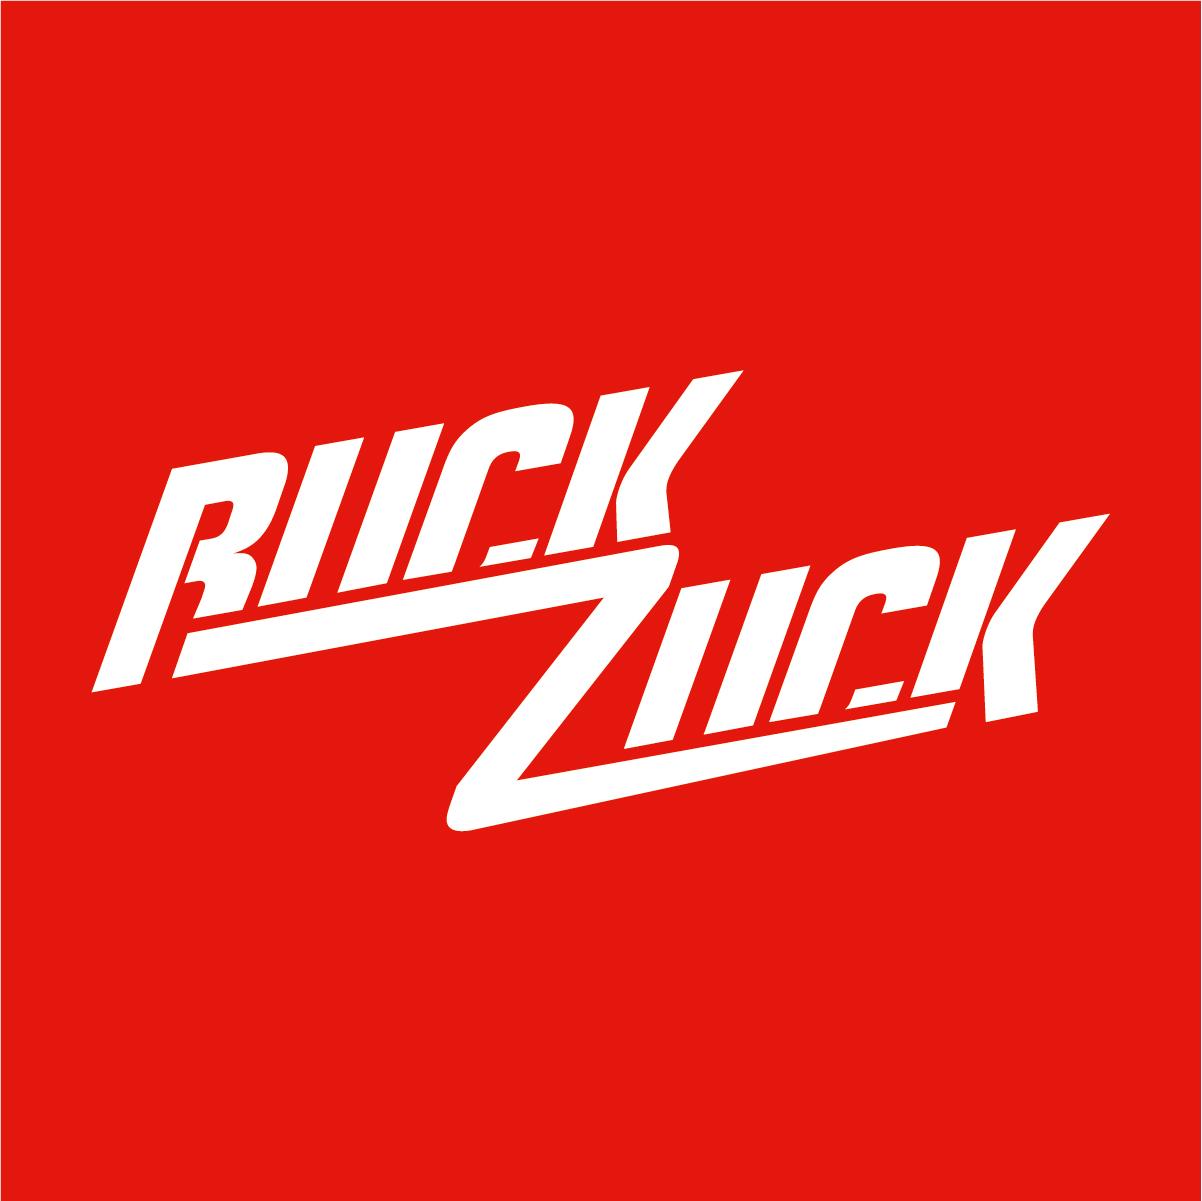 CERAMIN VARIO 3mm Fliese x-tra breit Tadelakt grau-braun PVC-frei